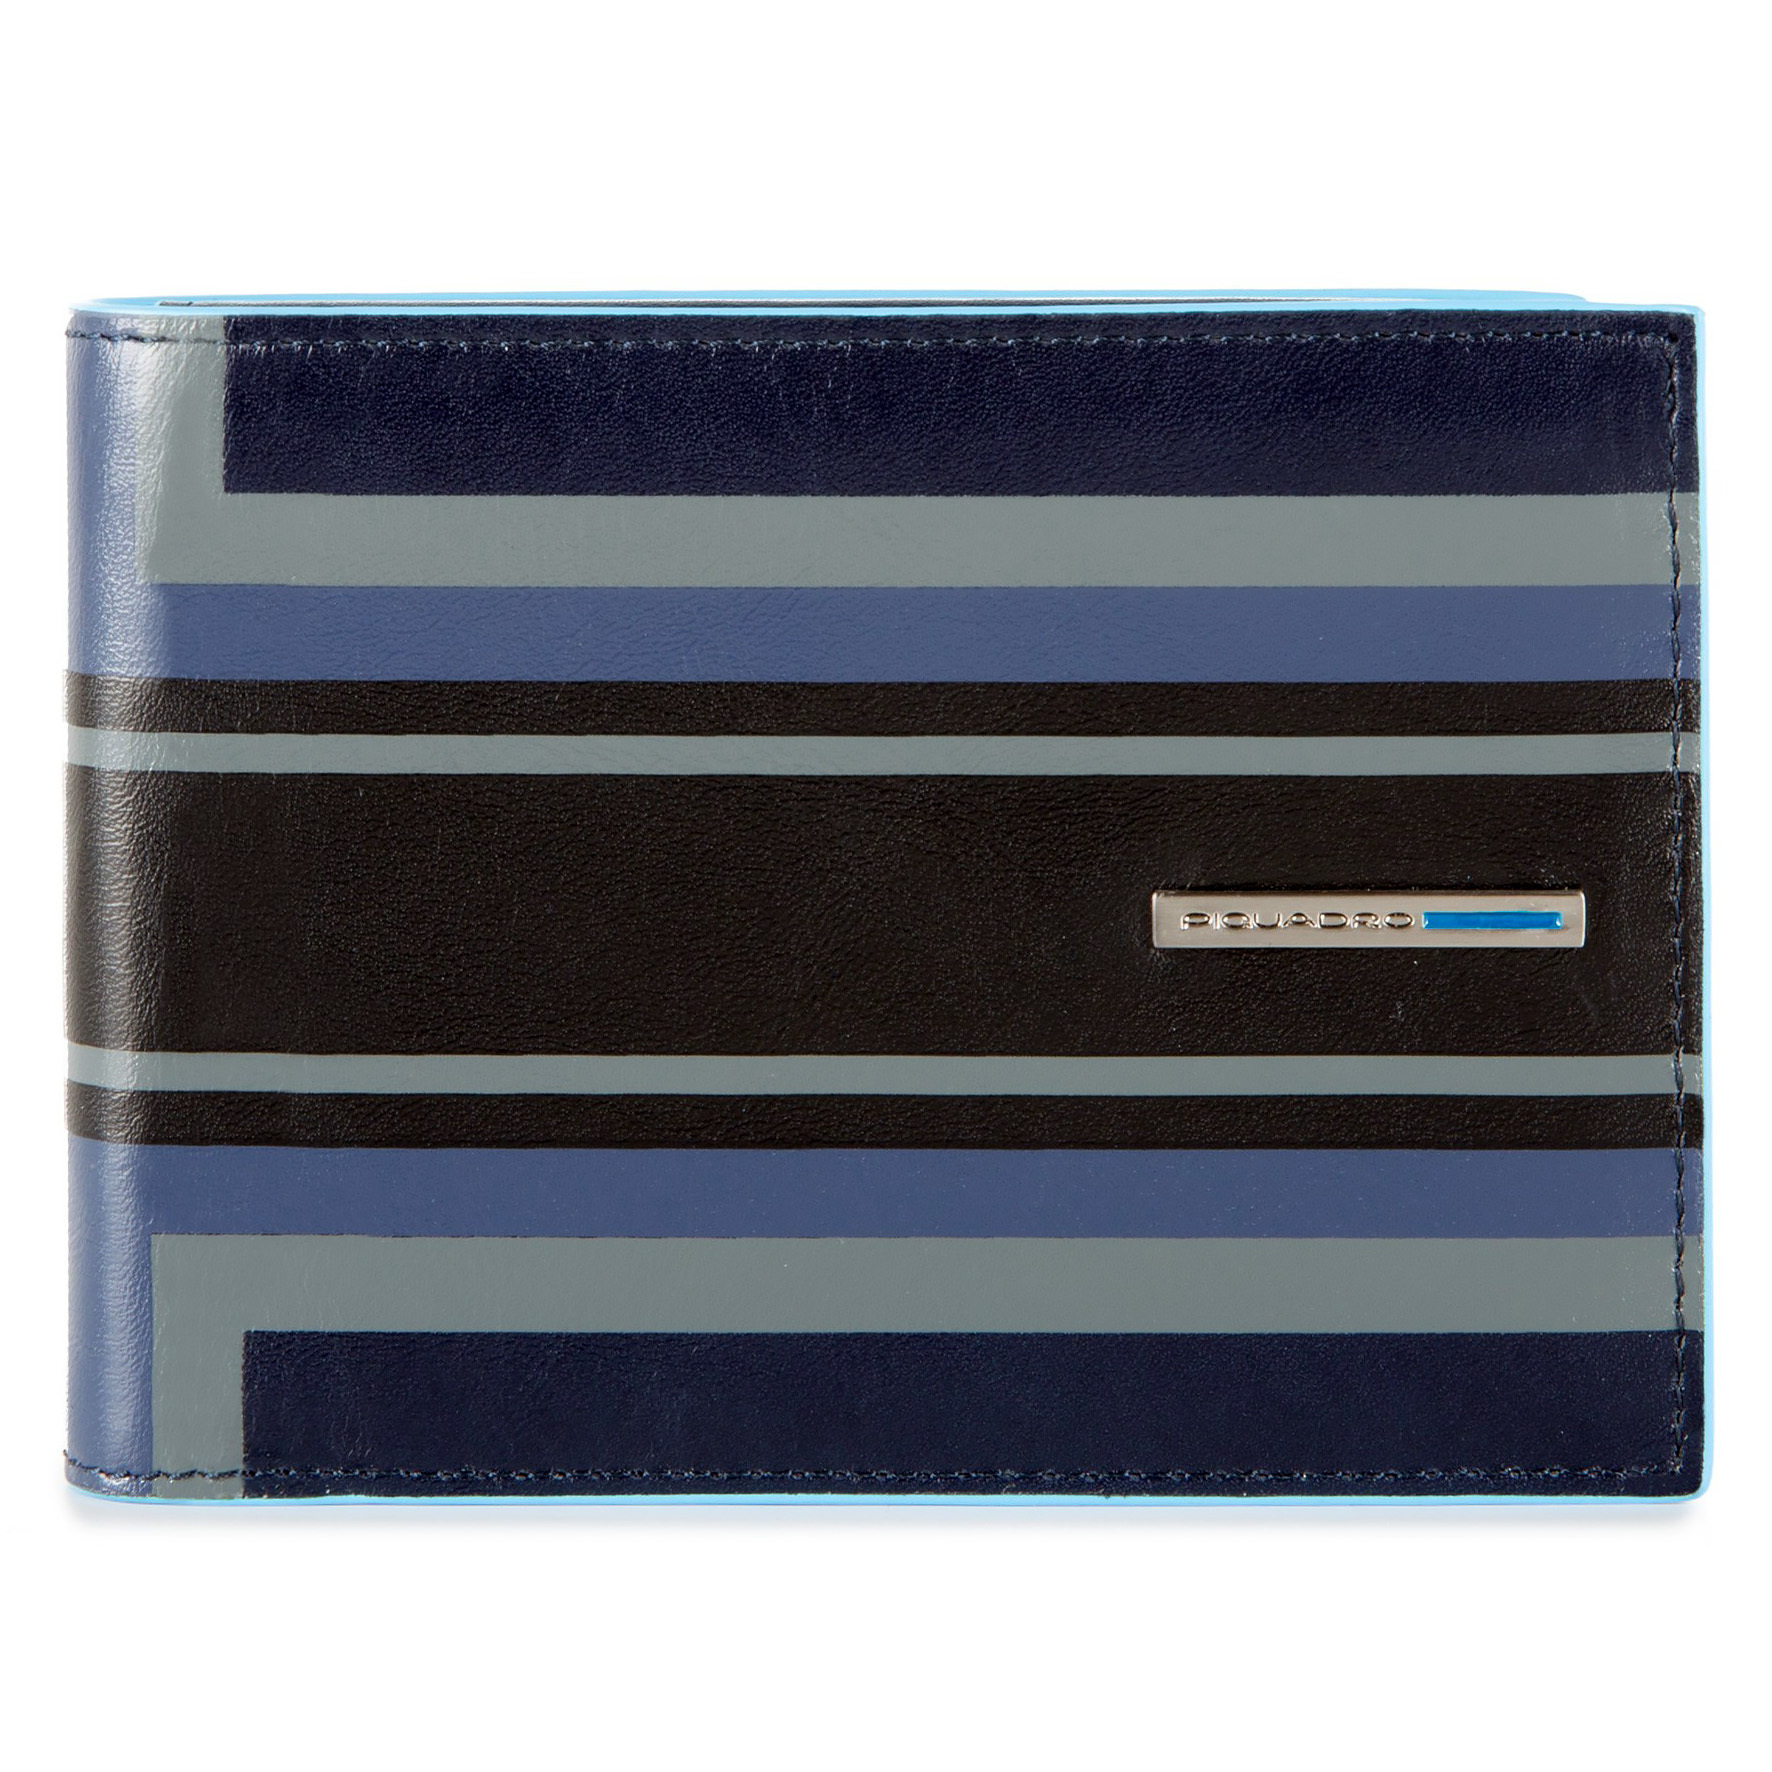 Кошелек мужской Piquadro Blue Square, цвет синий, 12,5x9x2 см (PU257B2SER/BLU)